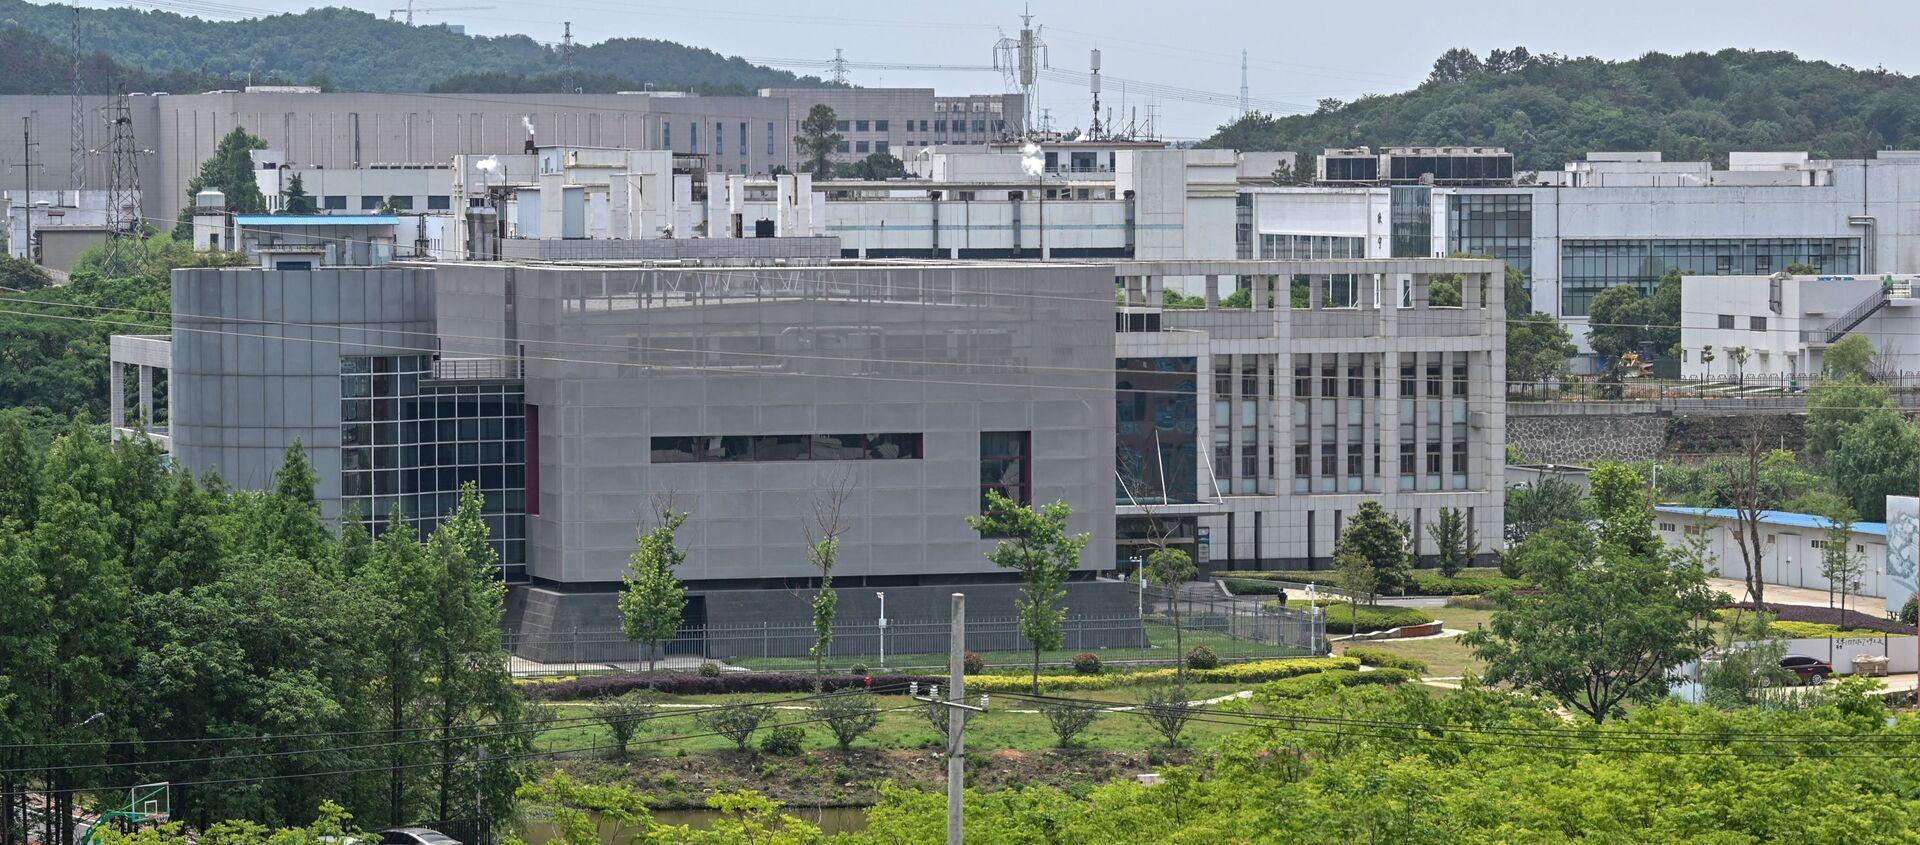 武漢市の研究所 - Sputnik 日本, 1920, 10.10.2021